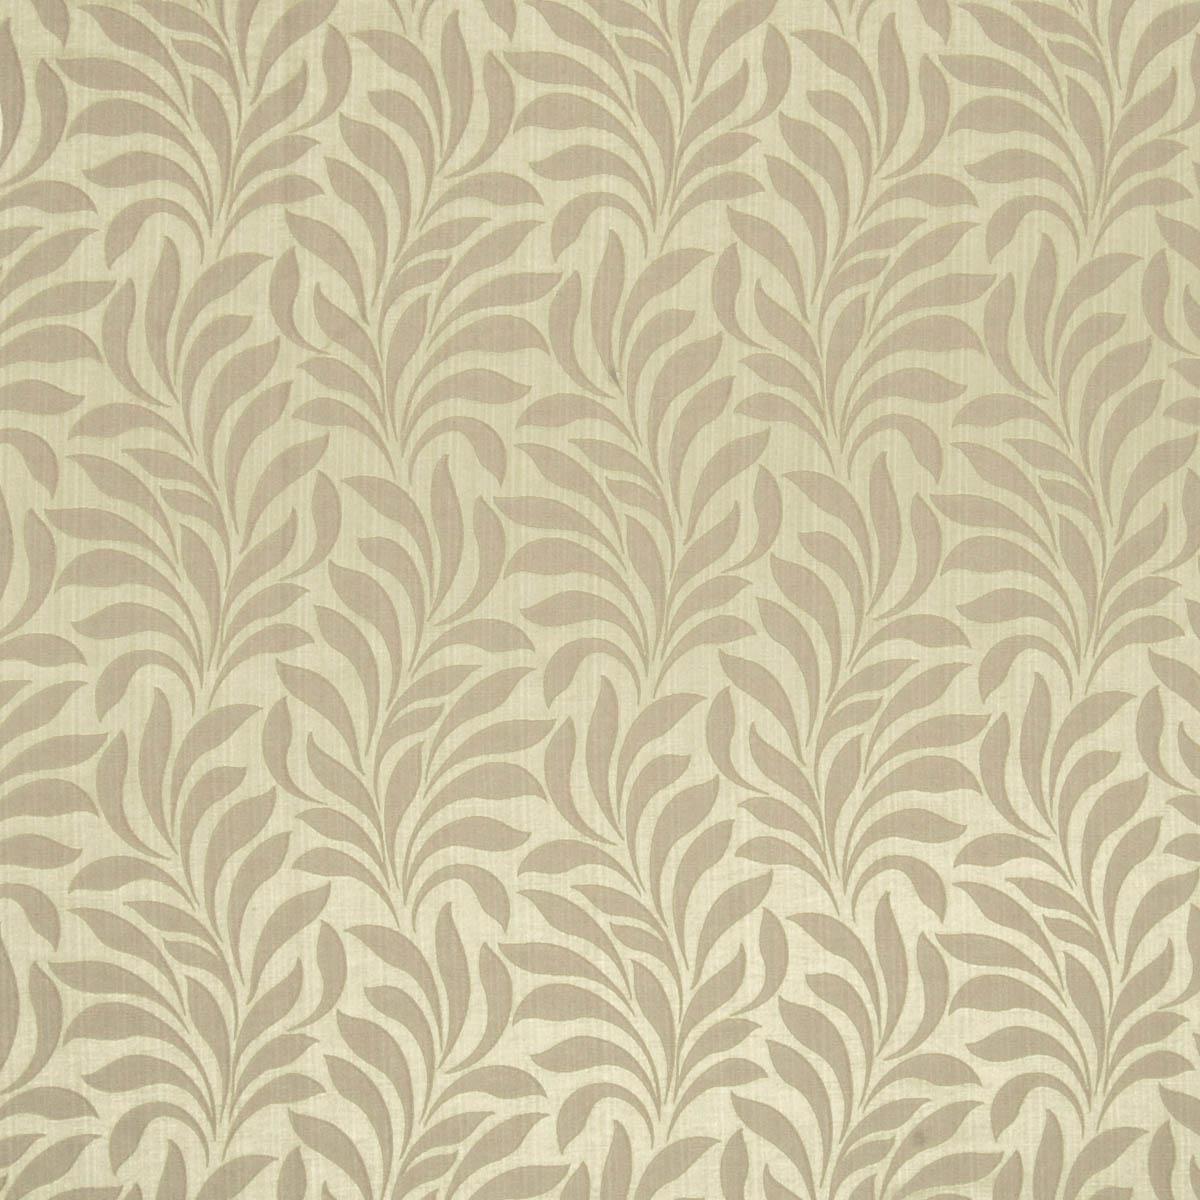 Neutral Embroiderd Linen Fabric Sanderson Fabric Fabric Textures Curtain Fabric Fabric Wallpaper